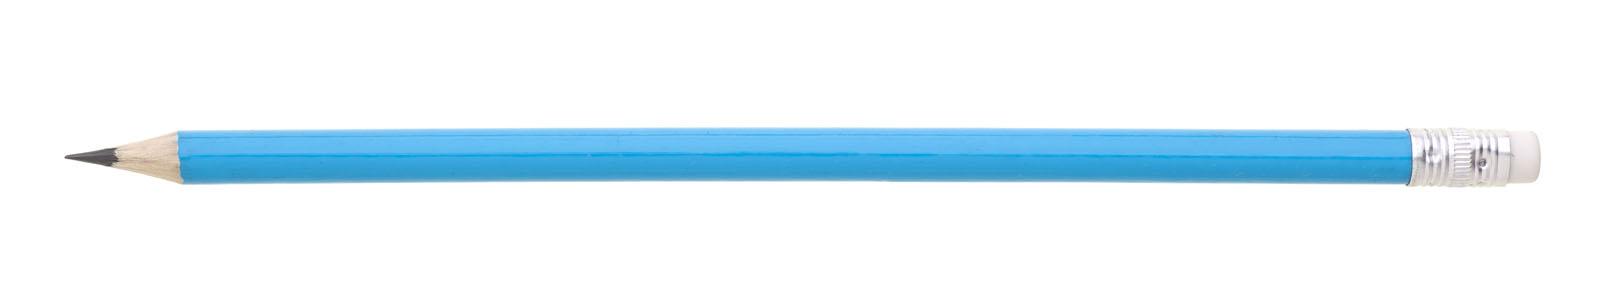 Tužka s gumou hrocená LUNGO